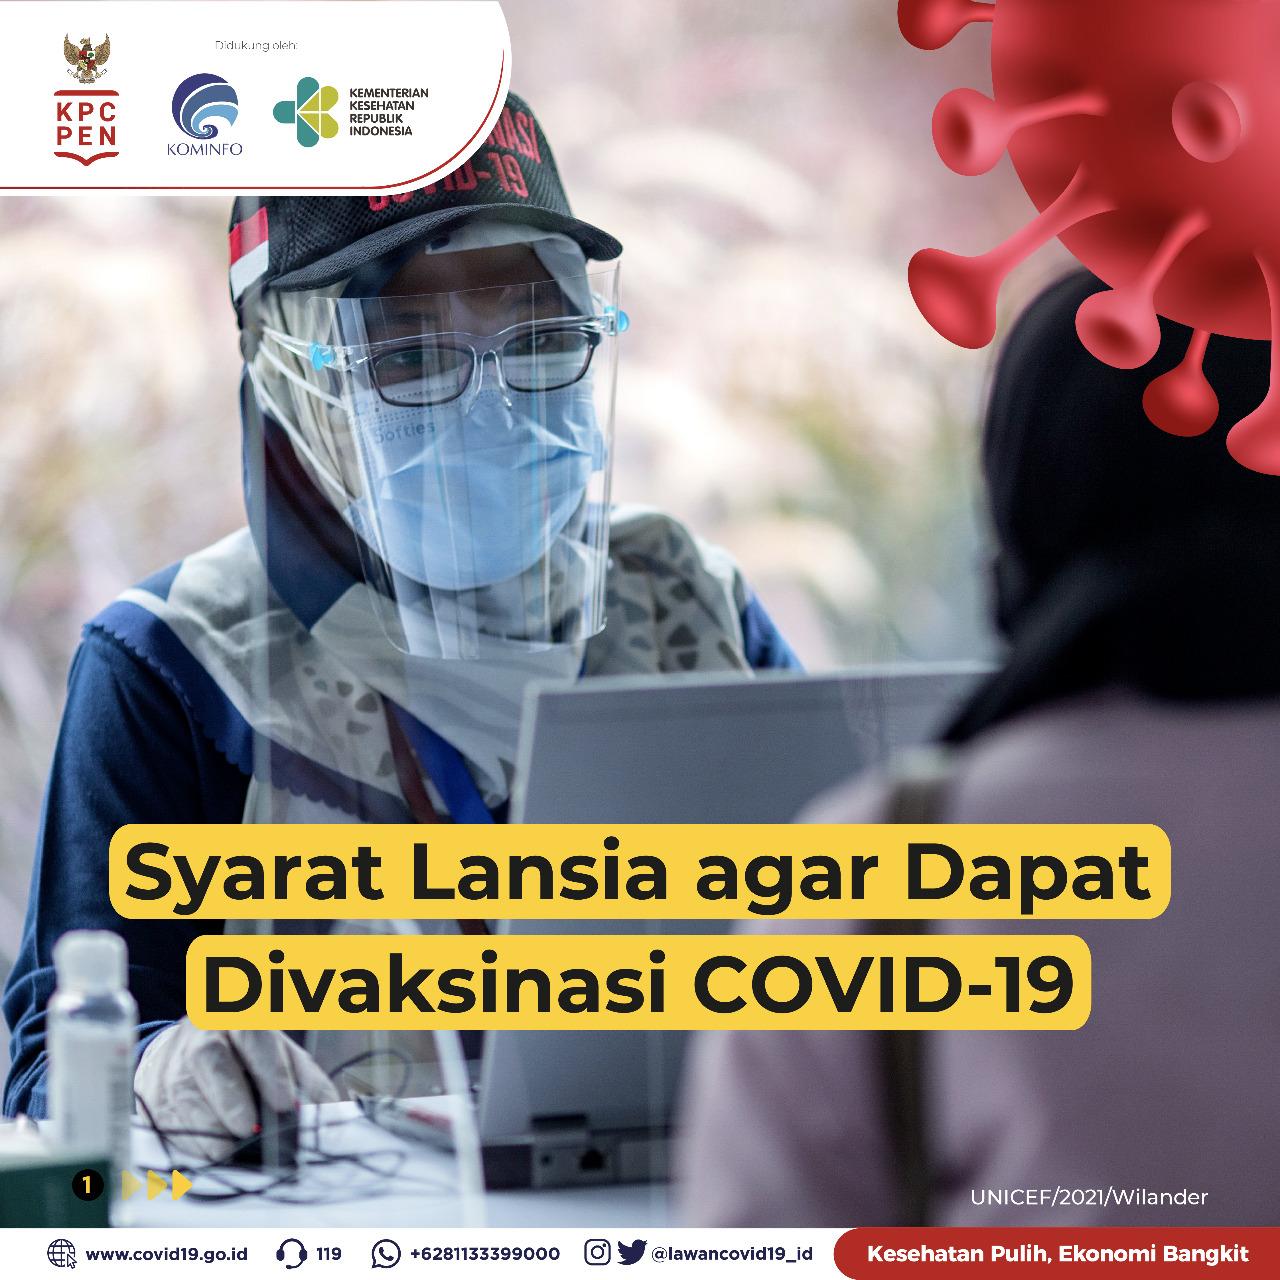 Syarat Lansia Agar Dapat Divaksinasi COVID-19